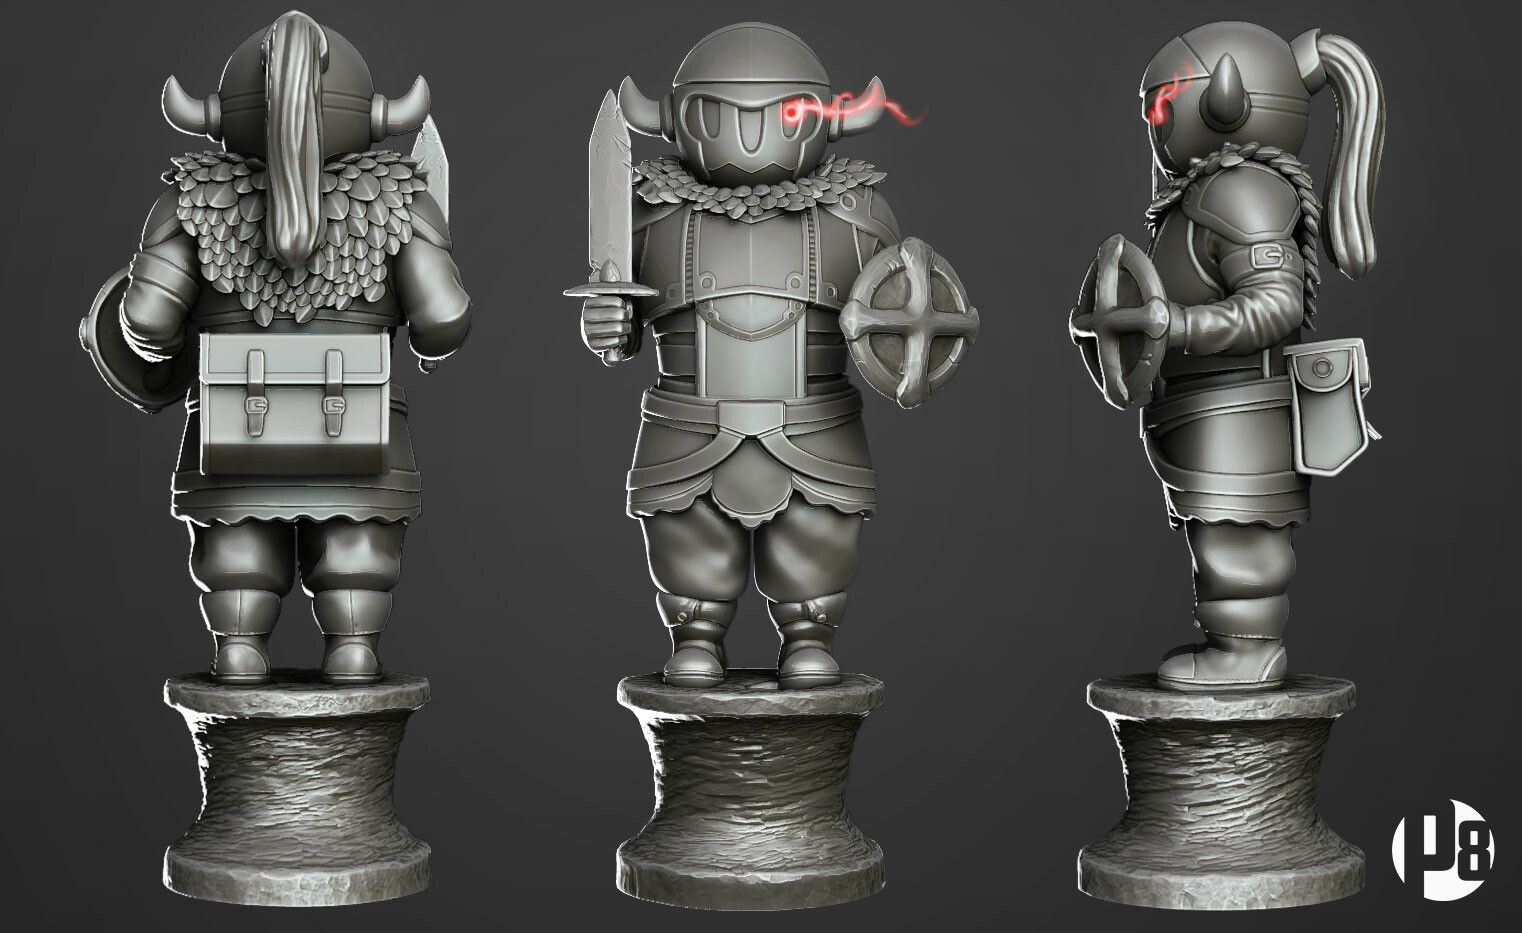 sculpt : version for 3D printing